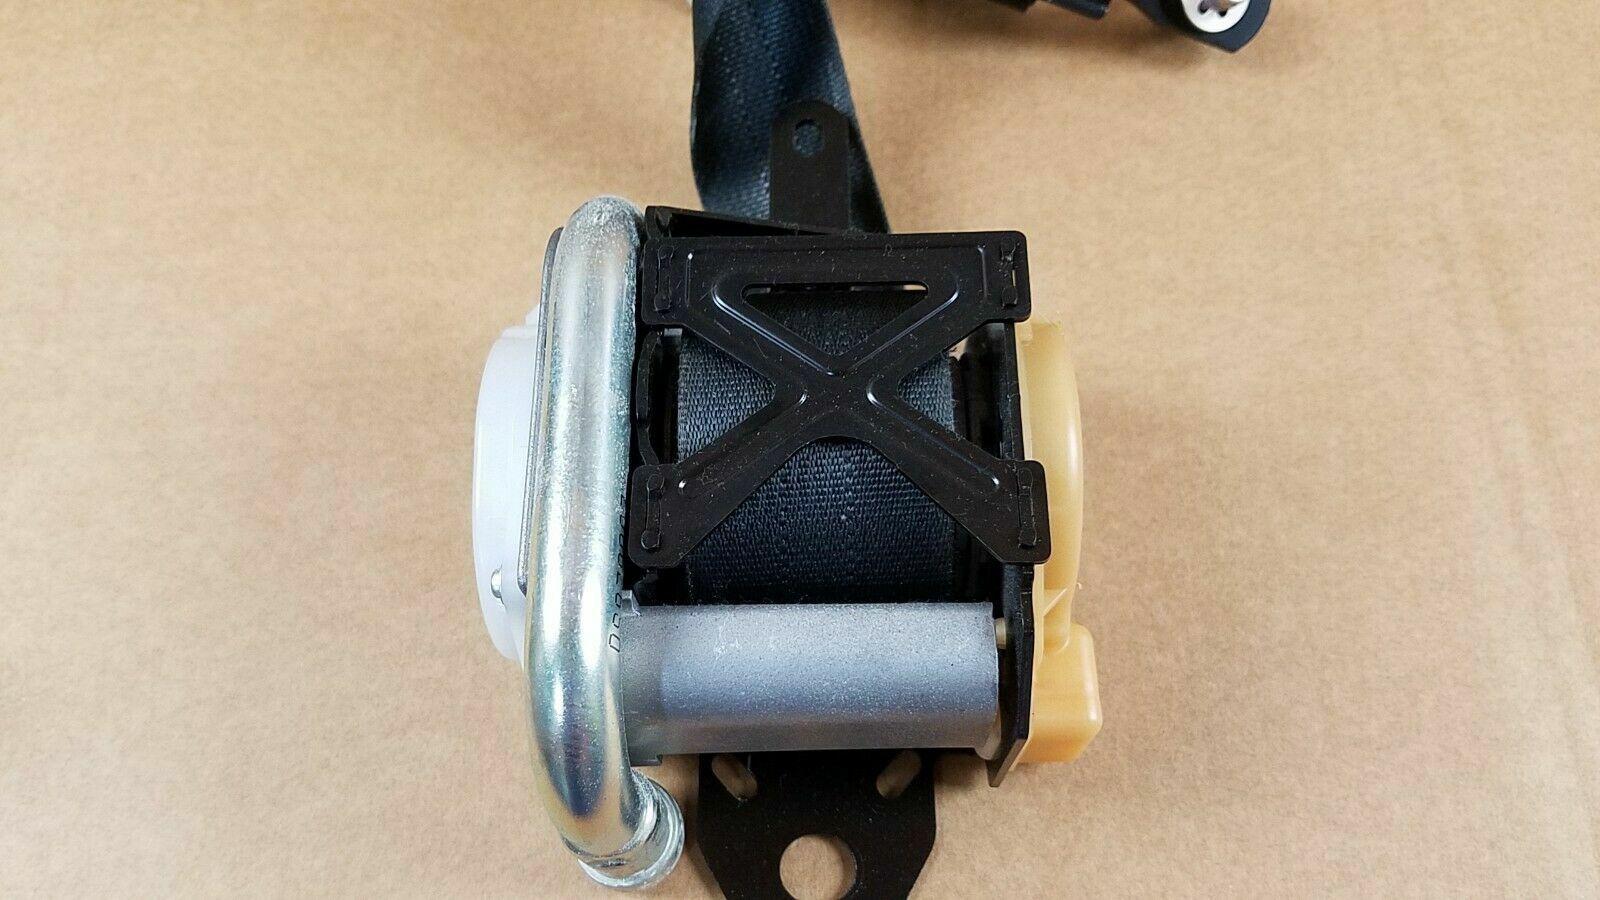 OEM 09-17 INFINITI FX35 QX70 FRONT LEFT DRIVER SIDE SEAT BELT RETRACTOR BLACK